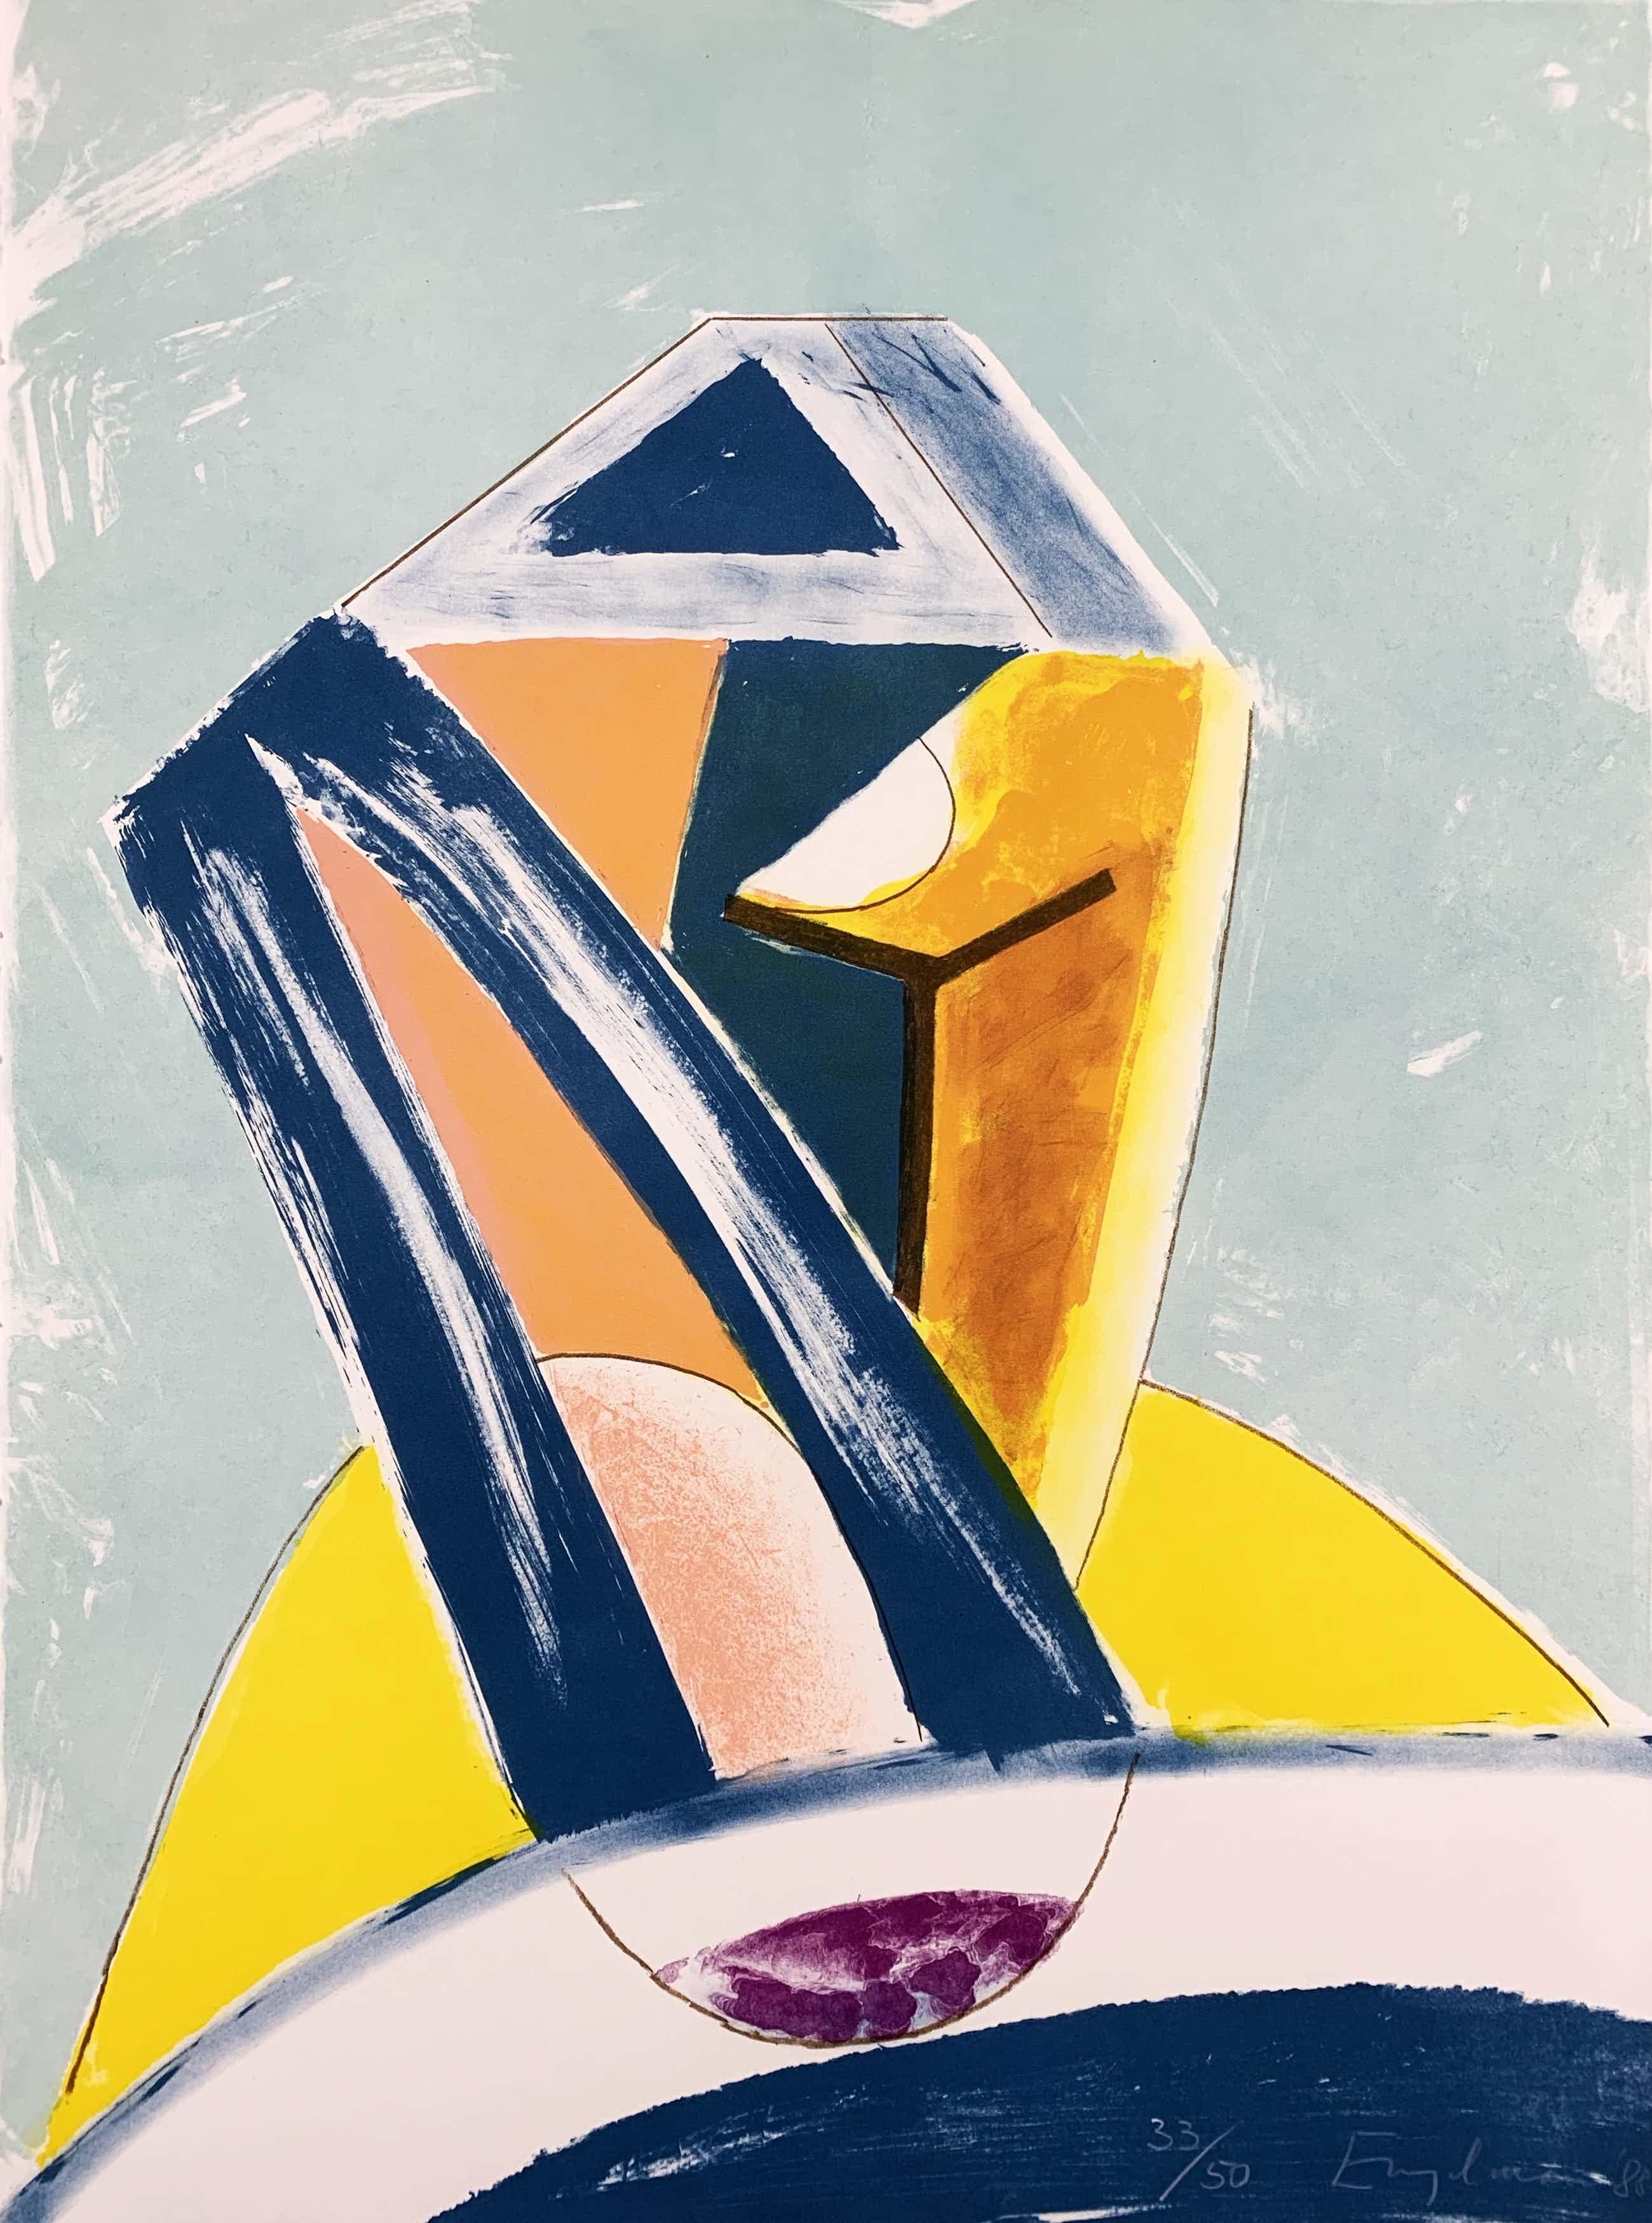 Martin Engelman - Grote kleurenlitho - zonder titel - 1988 (Kleine oplage) kopen? Bied vanaf 48!